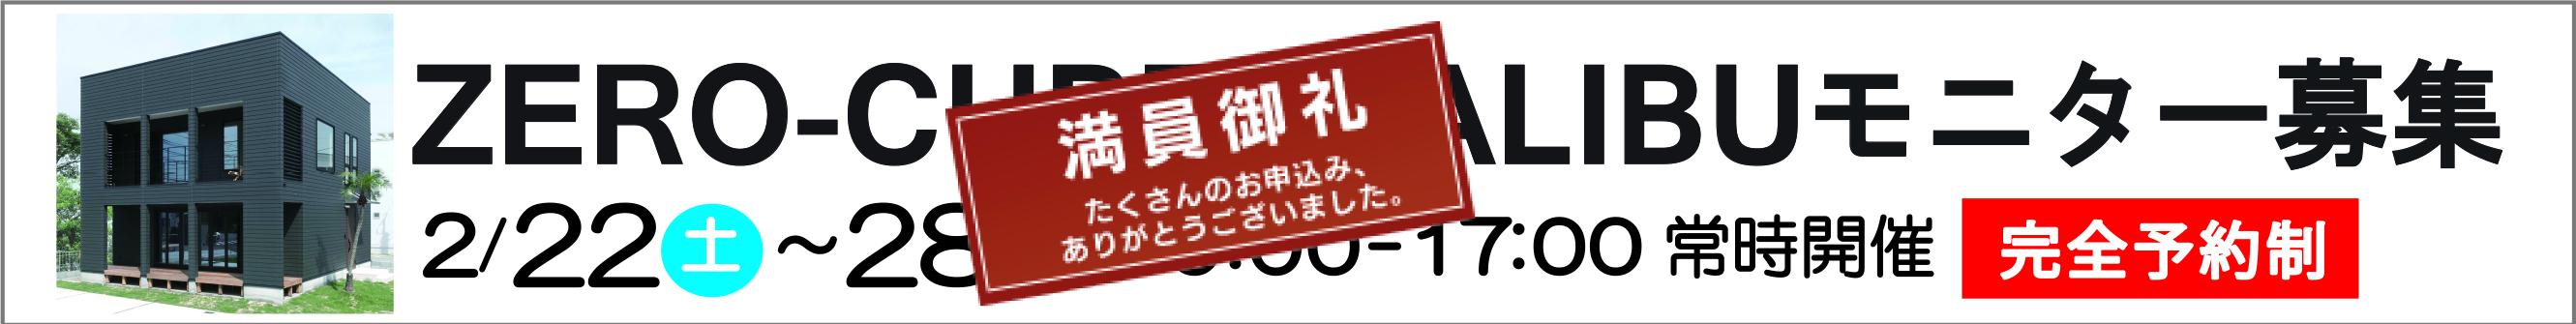 ZERO-CUBE MALIBU 建築モニター募集キャンペーン開催!